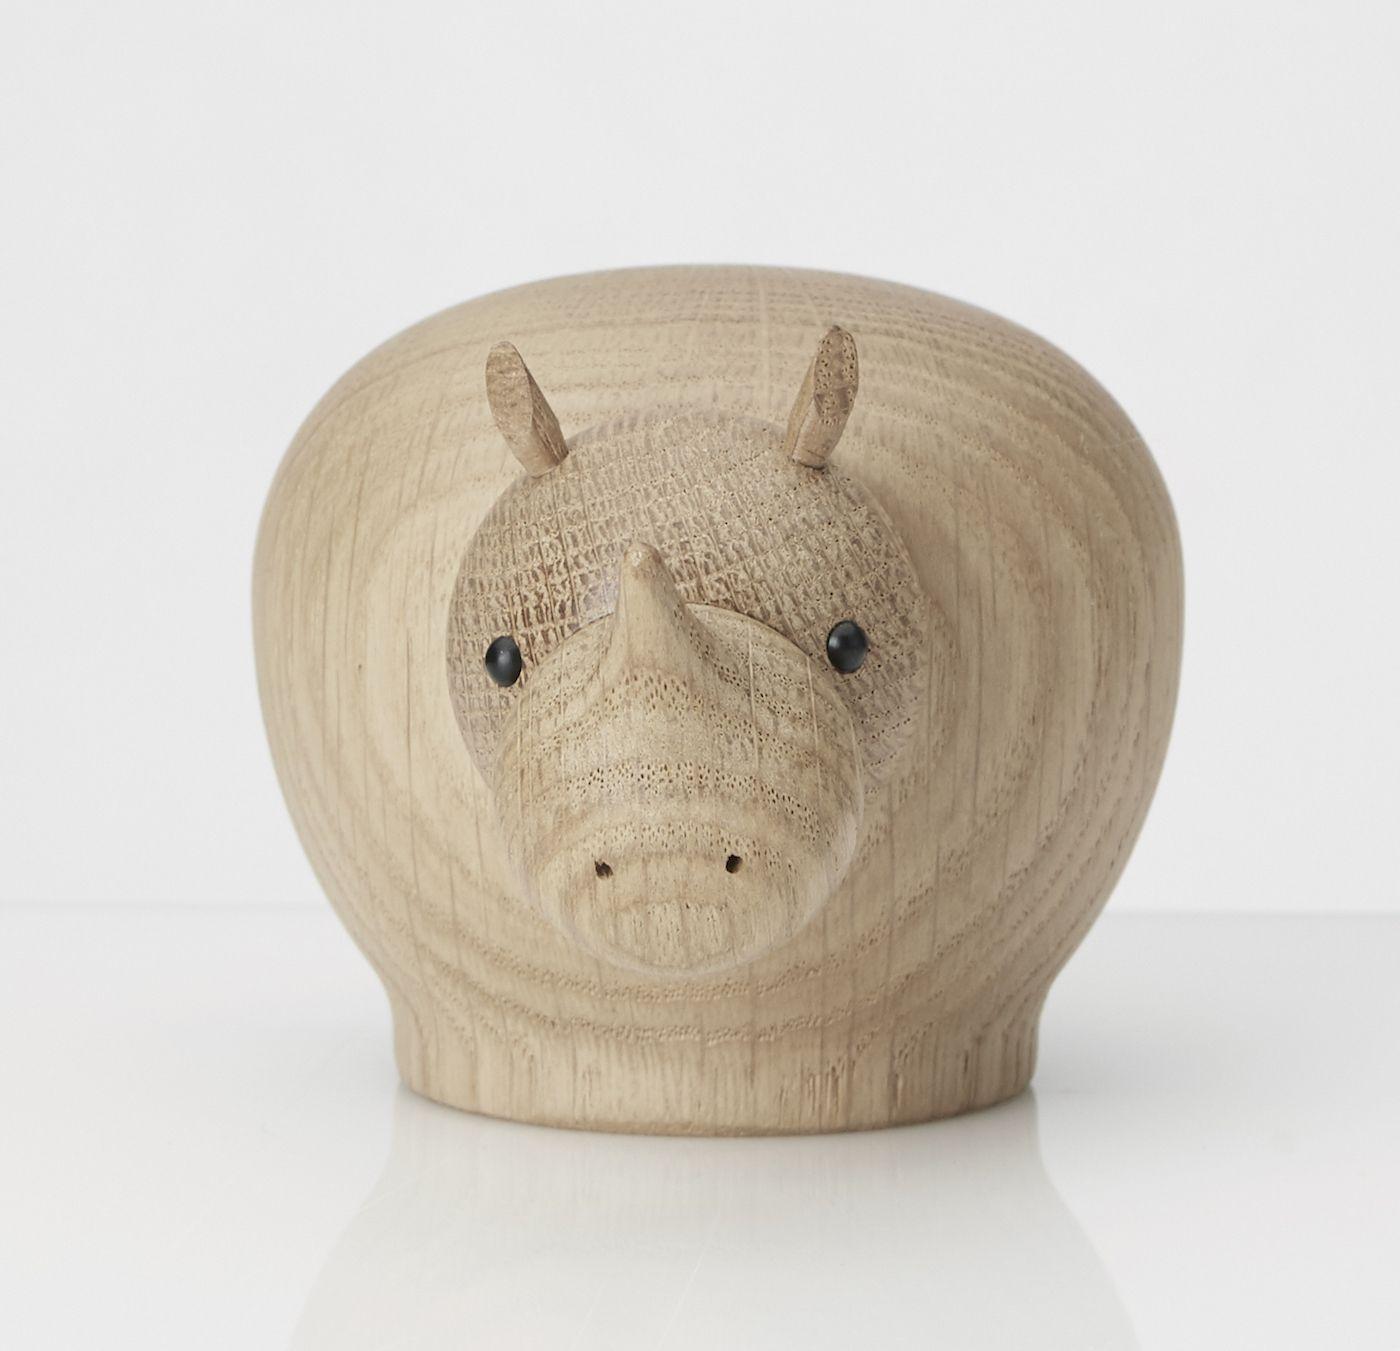 WOUD - Rina næsehorn i eg - small